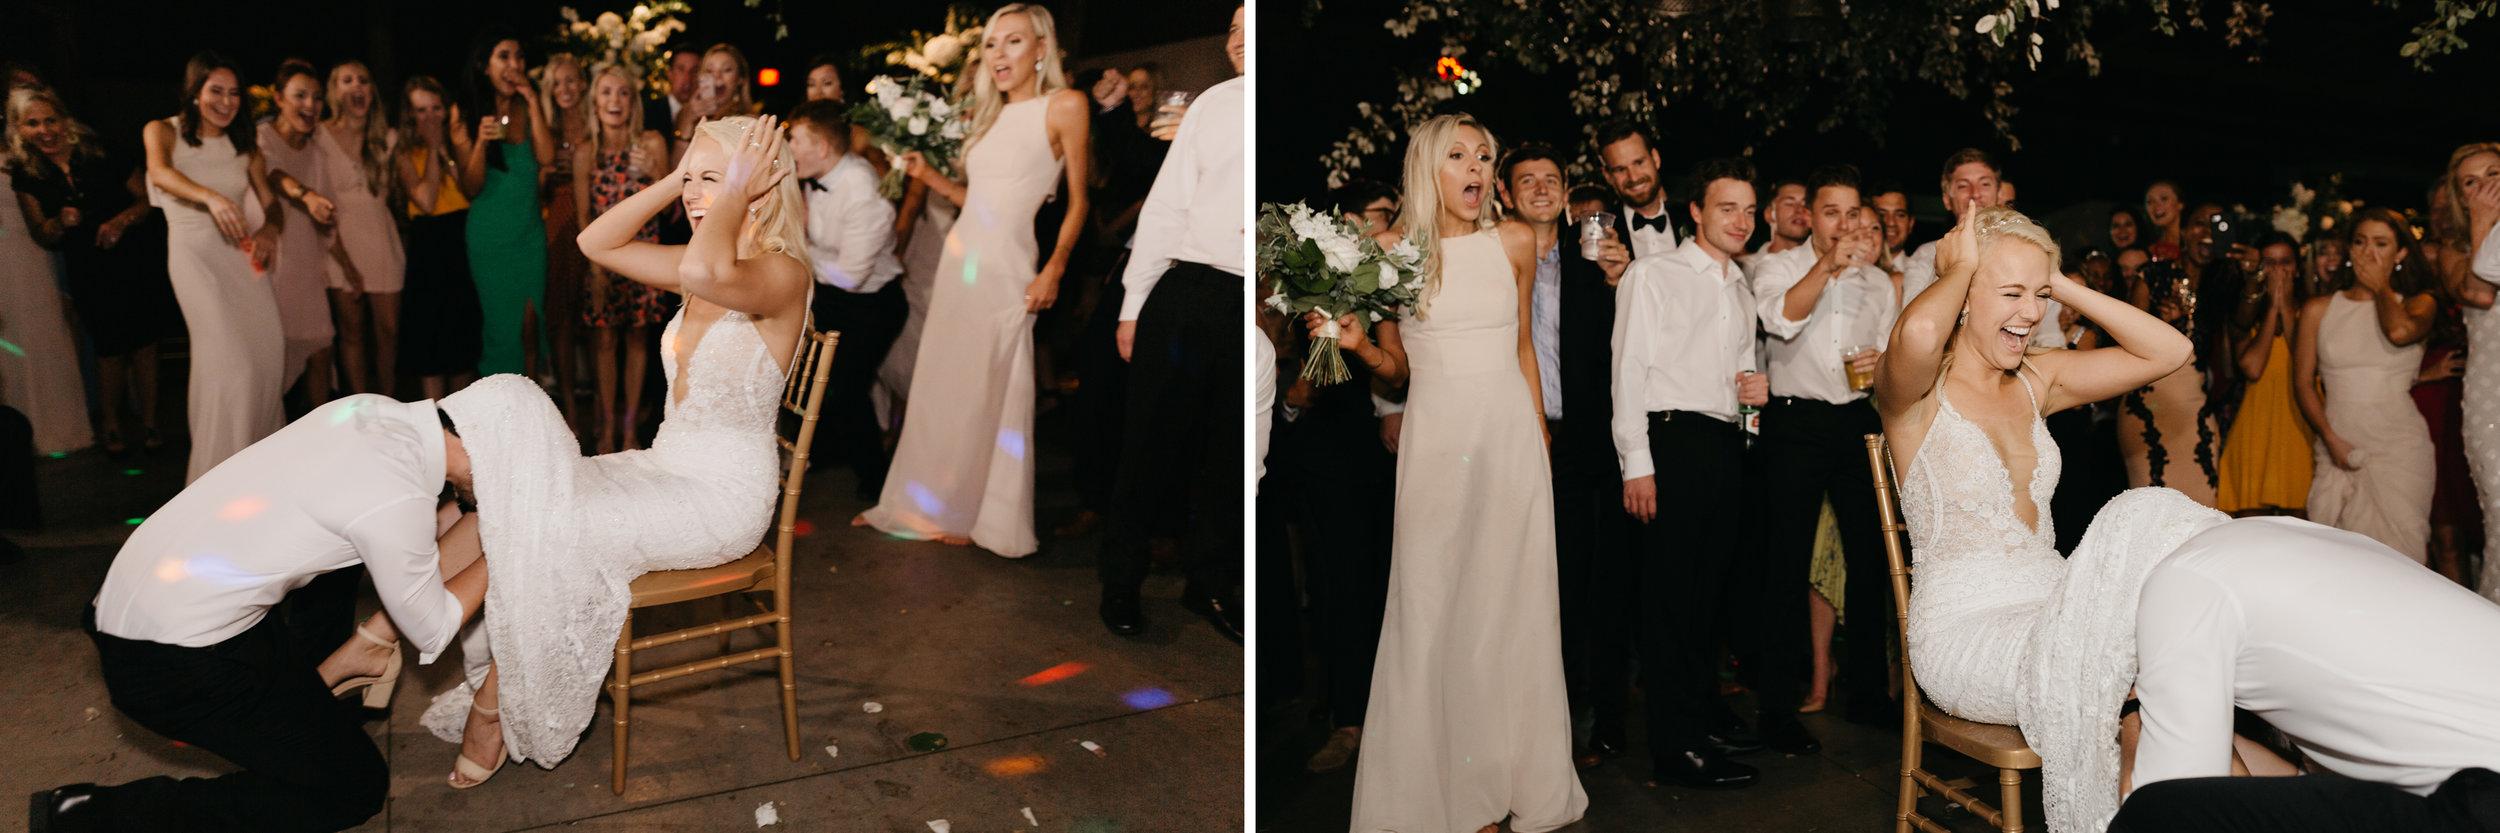 Miss America Wedding Photographer-99.jpg